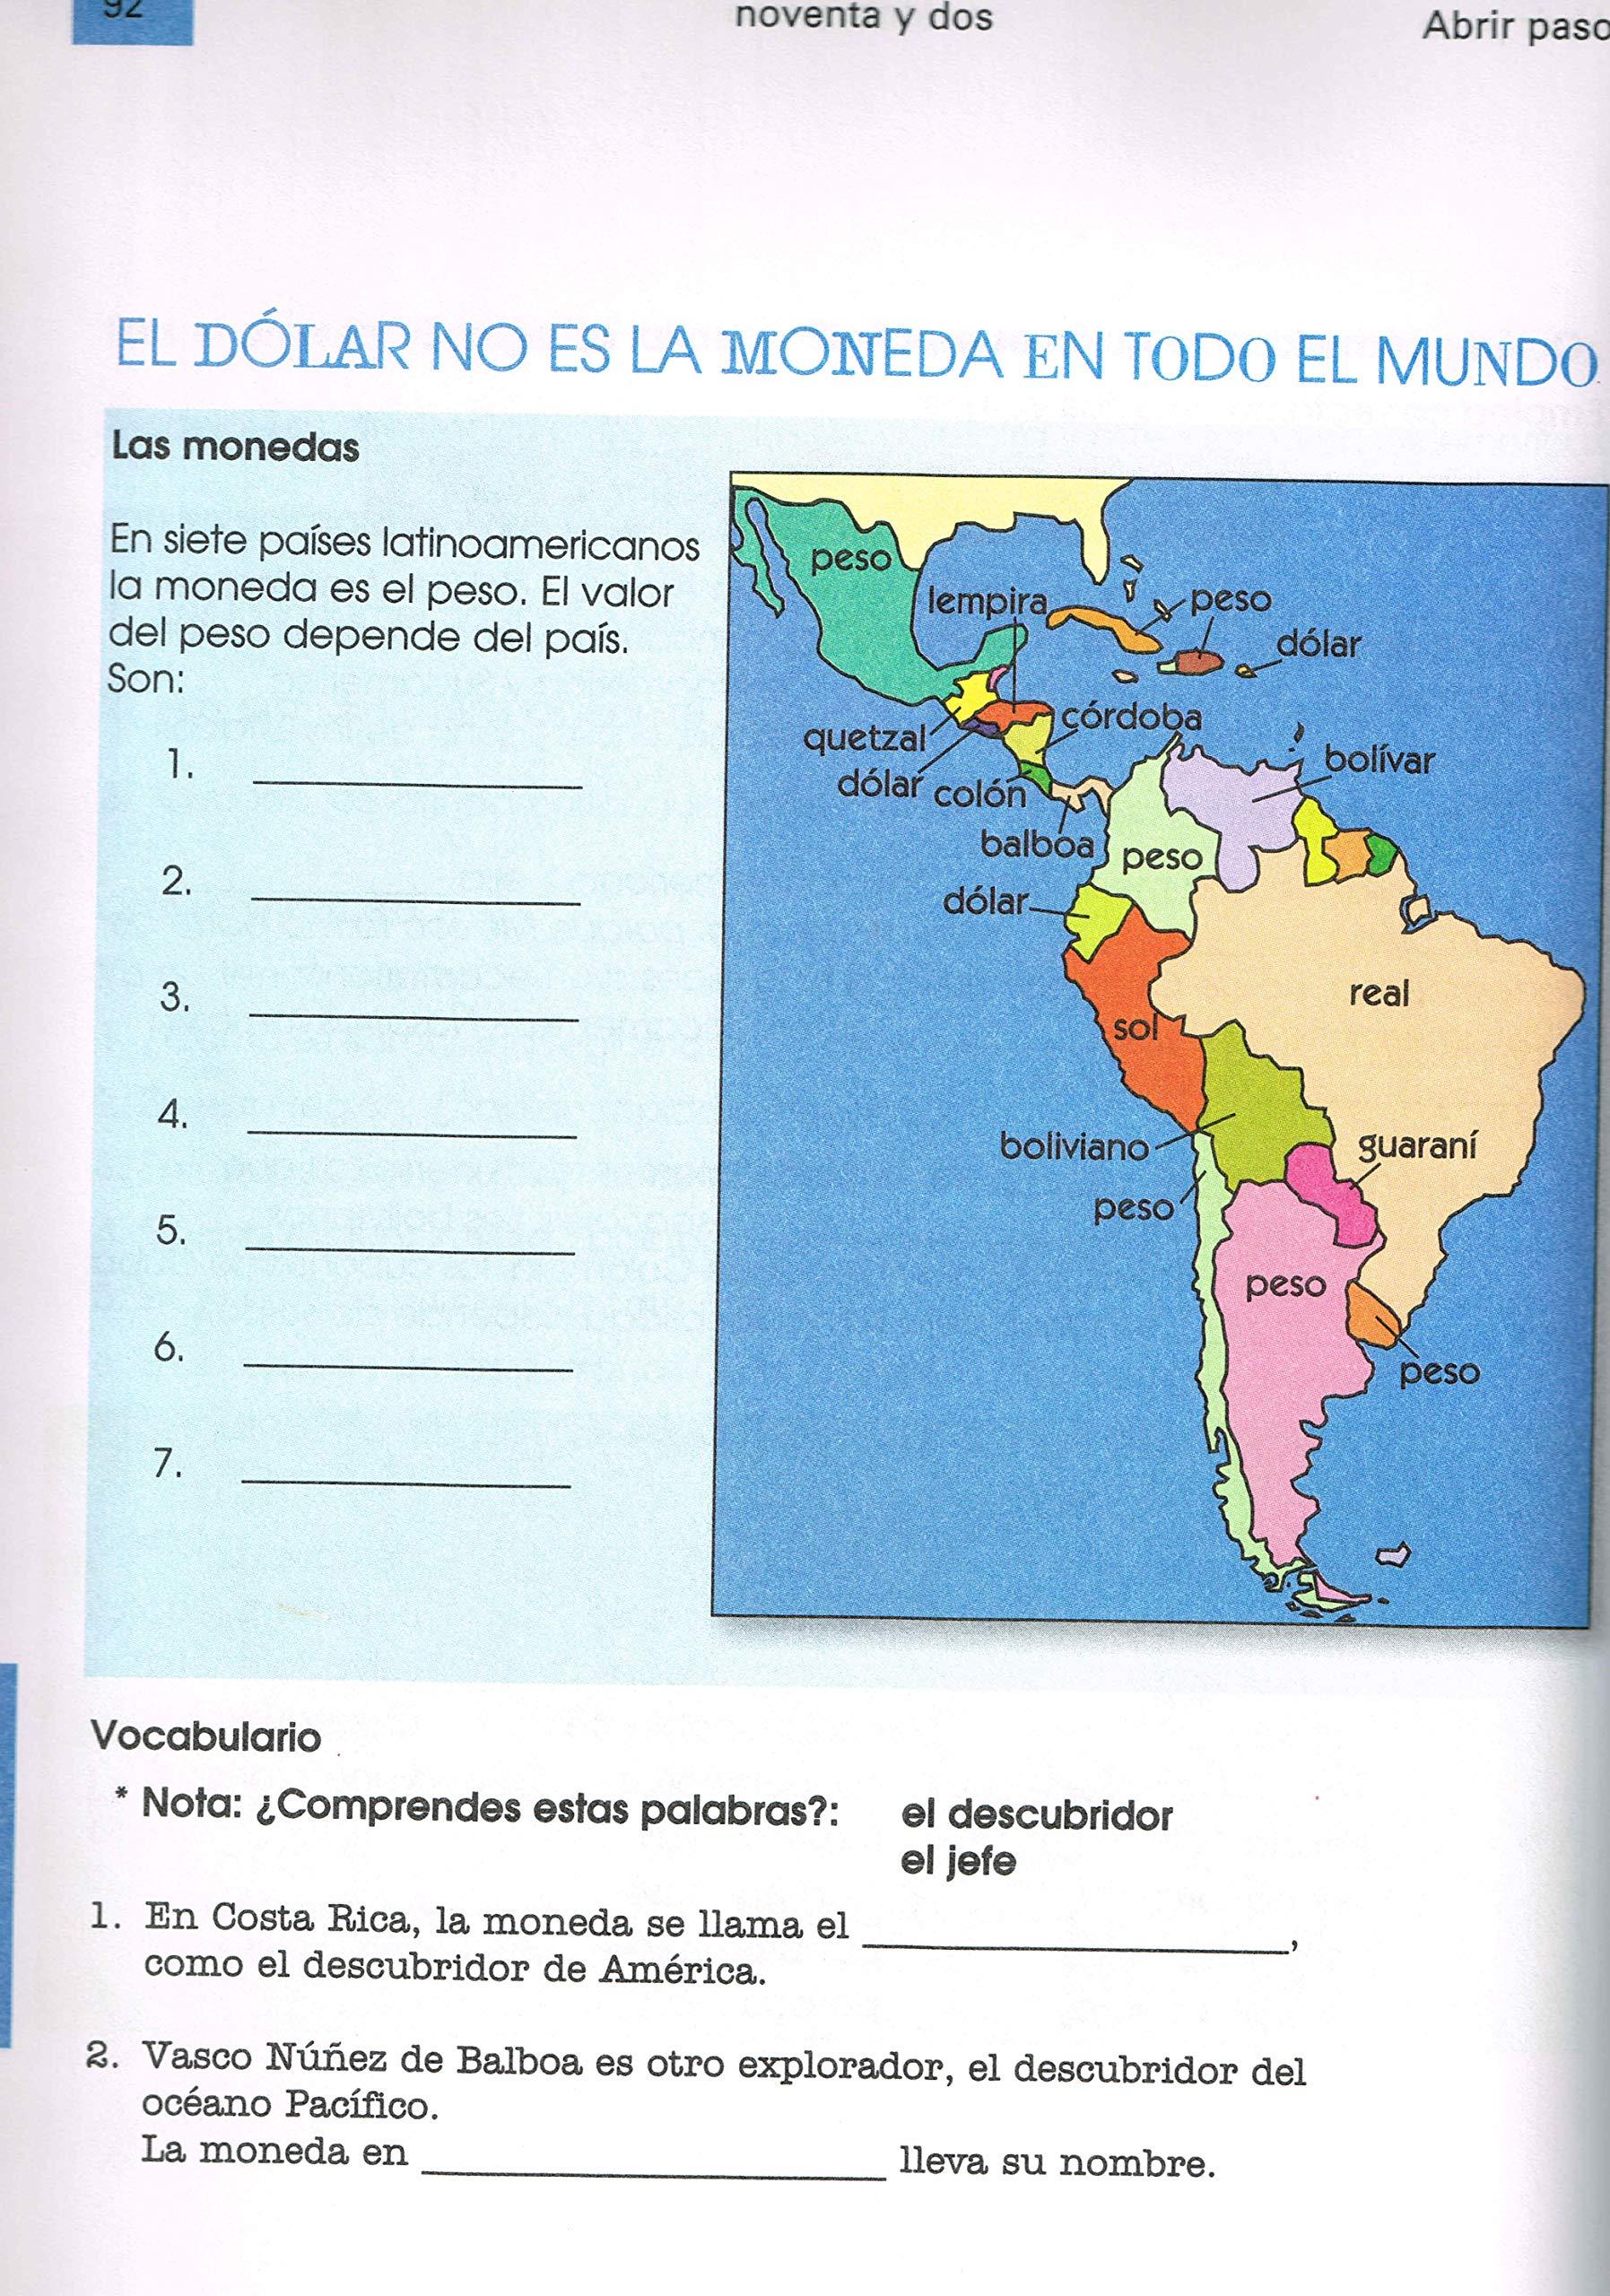 Abrir paso Libro 1 El mundo hispano - Unidades culturales interdisciplinarias: Eva Neisser Echenberg: 9782923851181: Amazon.com: Books